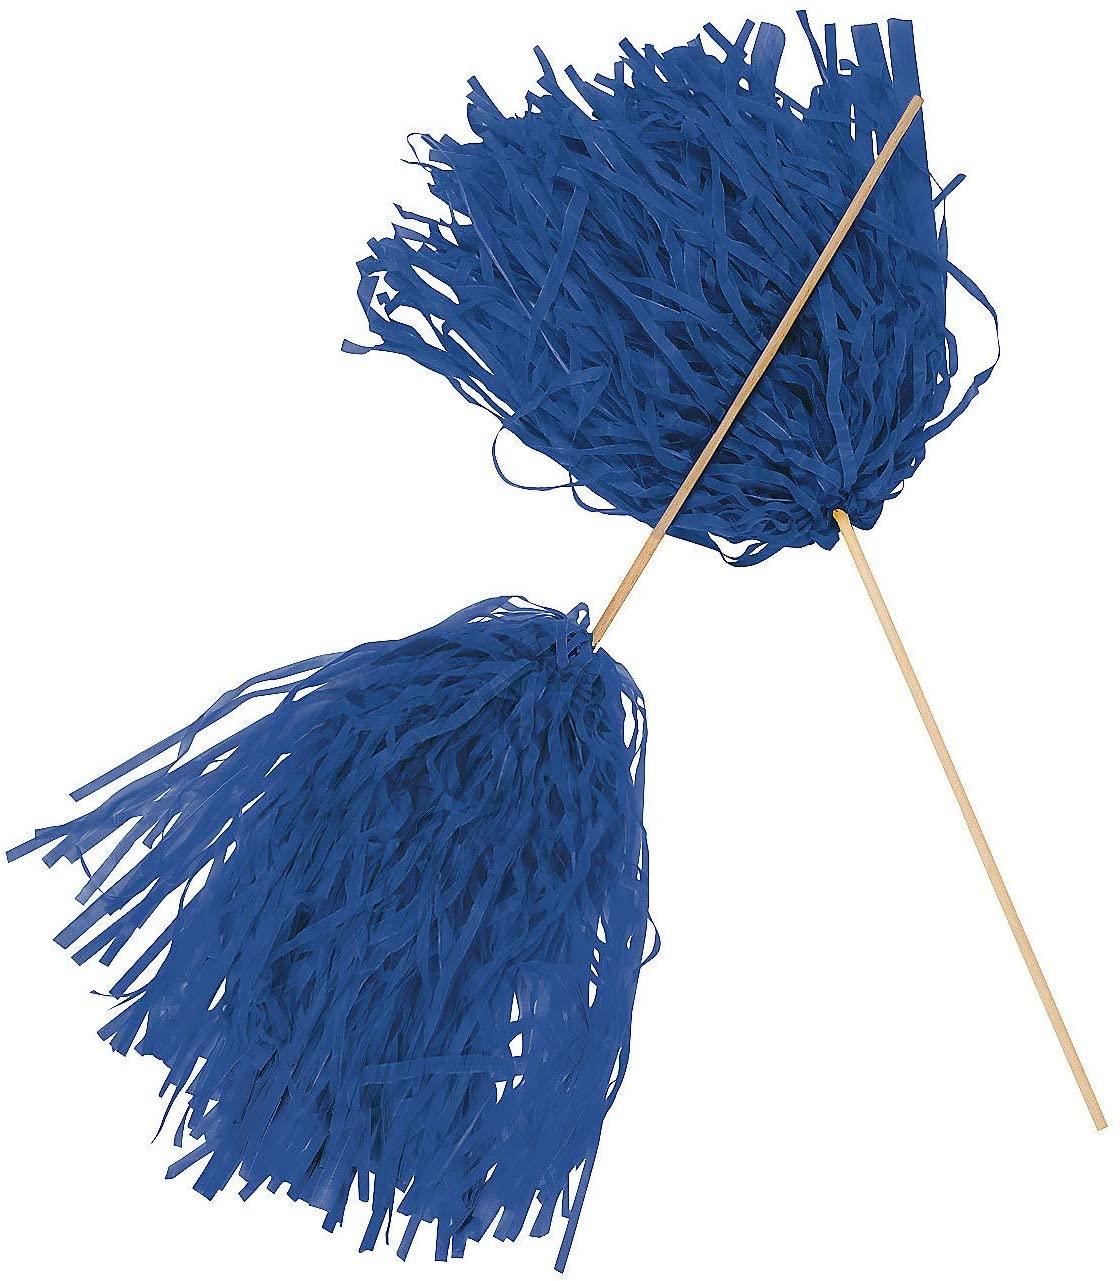 Spirit Pom-Poms - Blue - Novelty Toys & Pom - Poms (24 pieces)